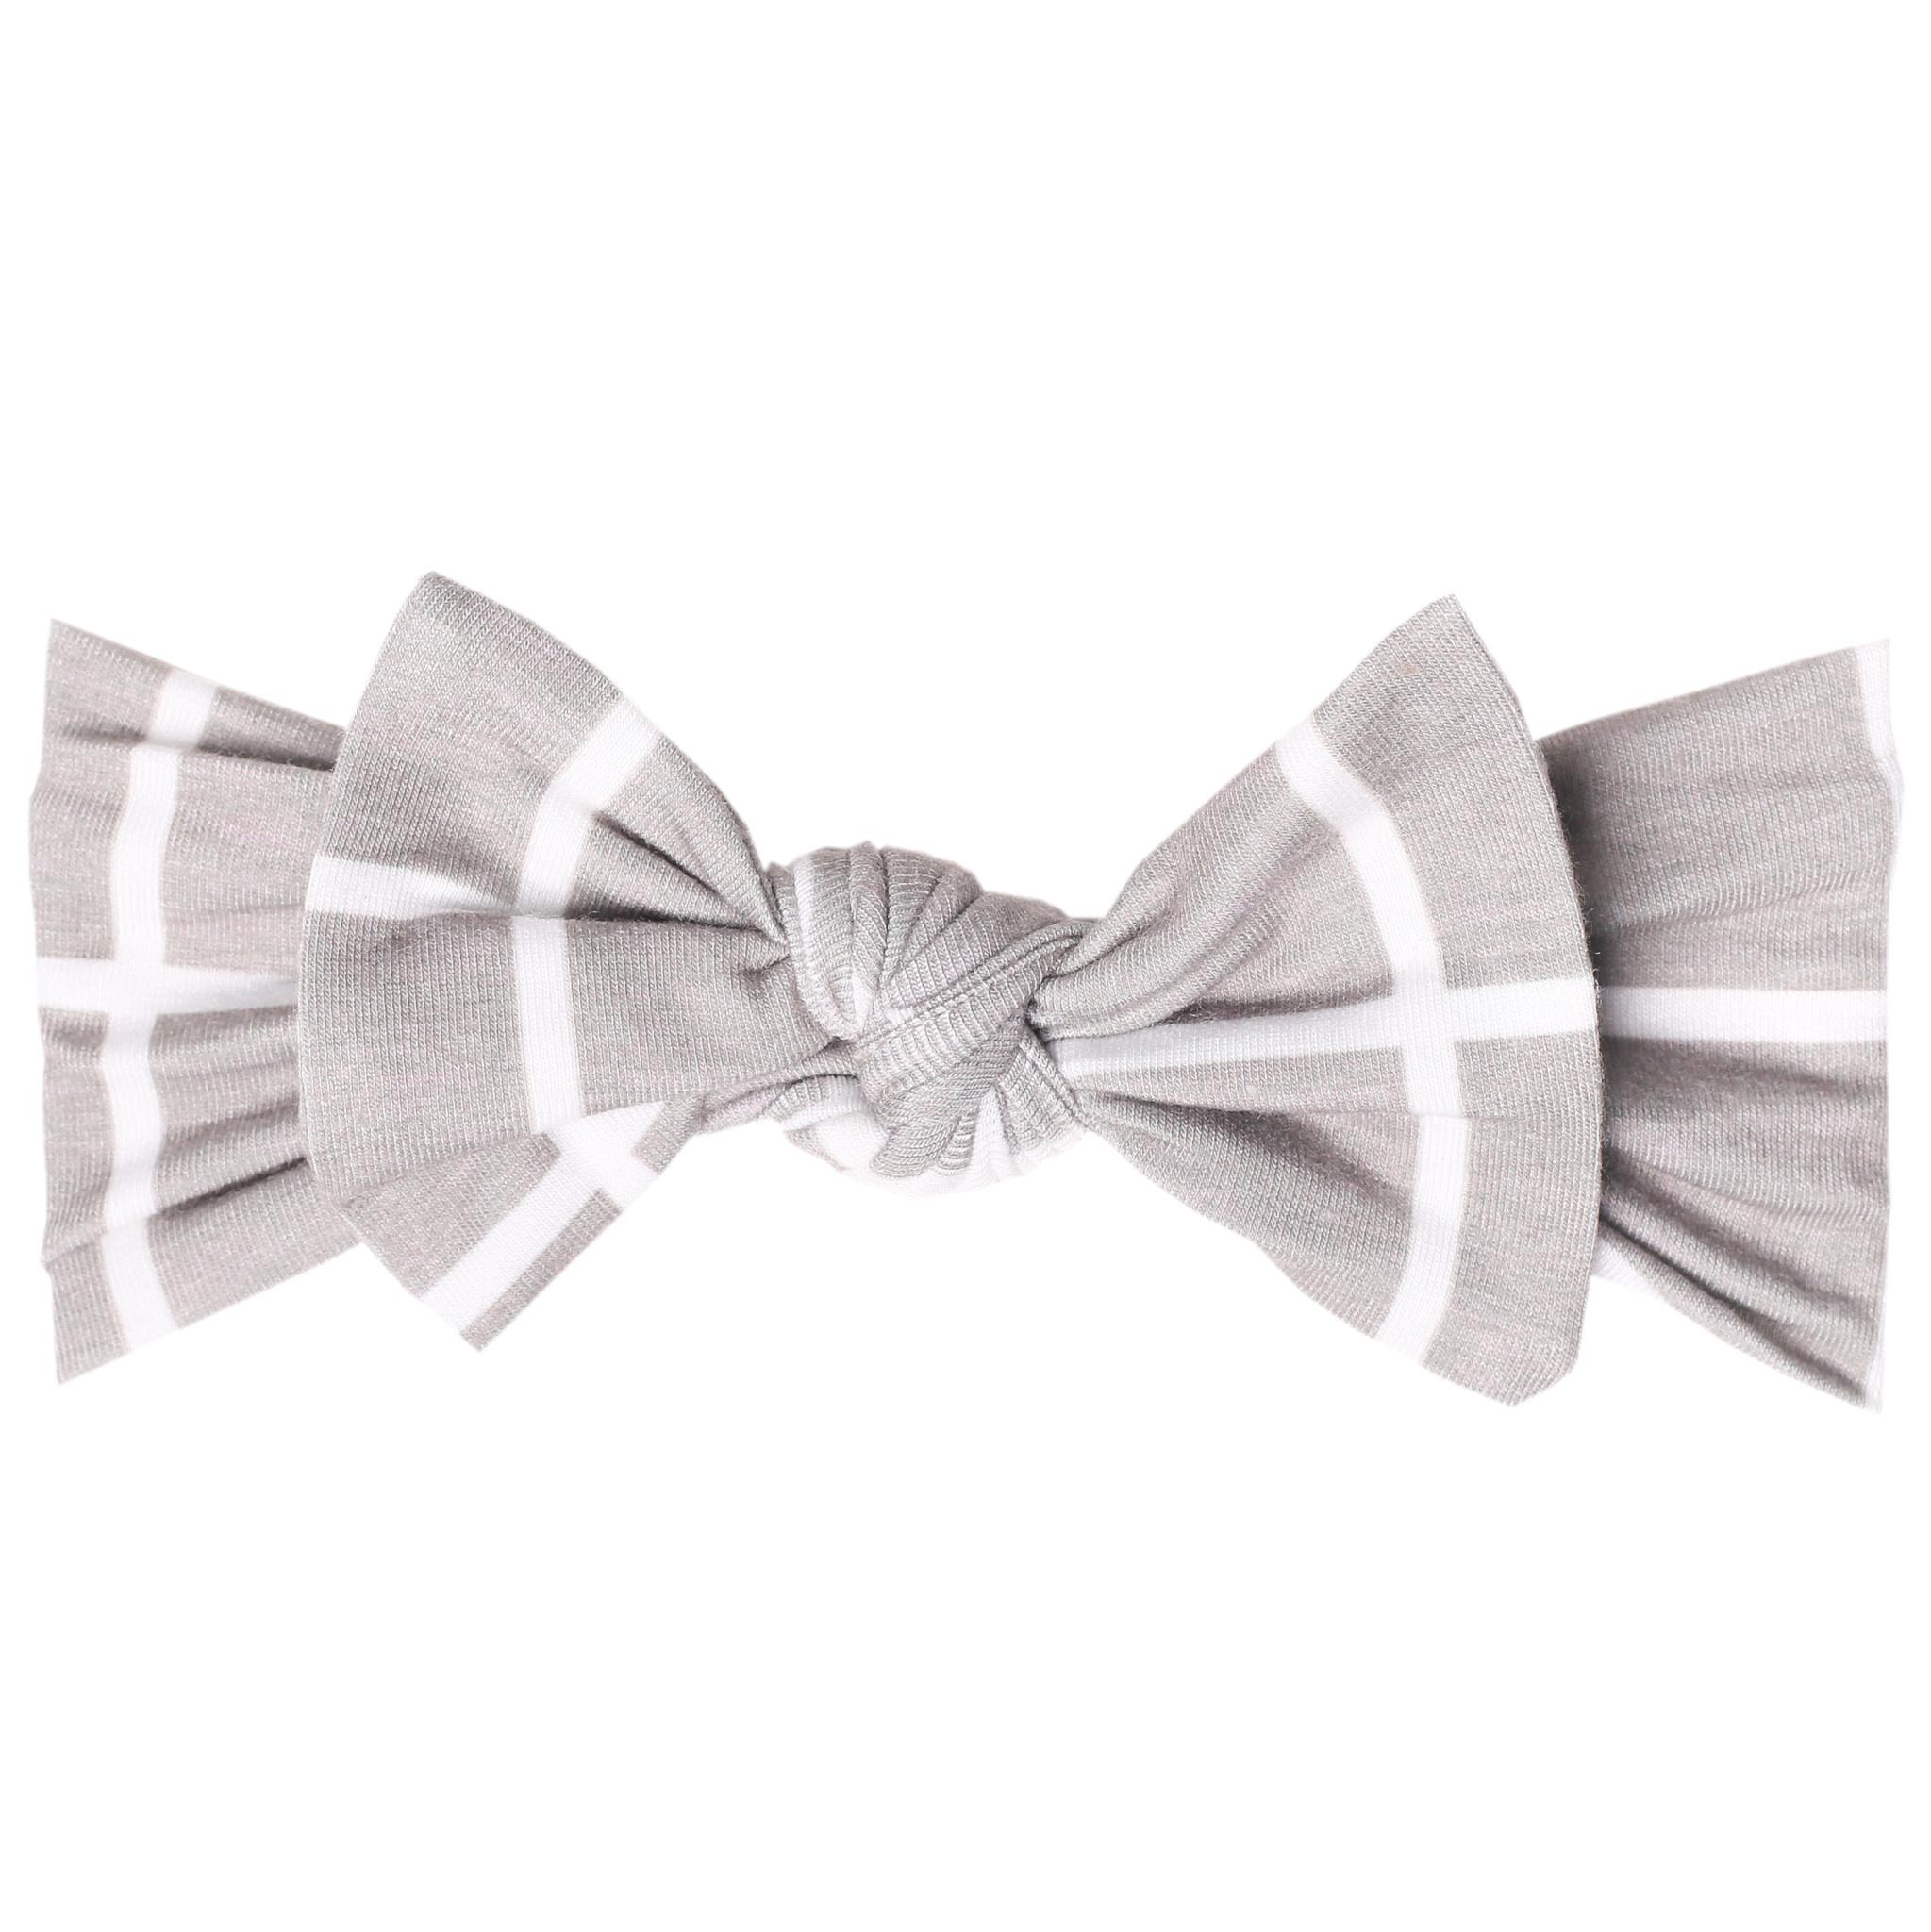 Copper Pearl Knit Headband Midway